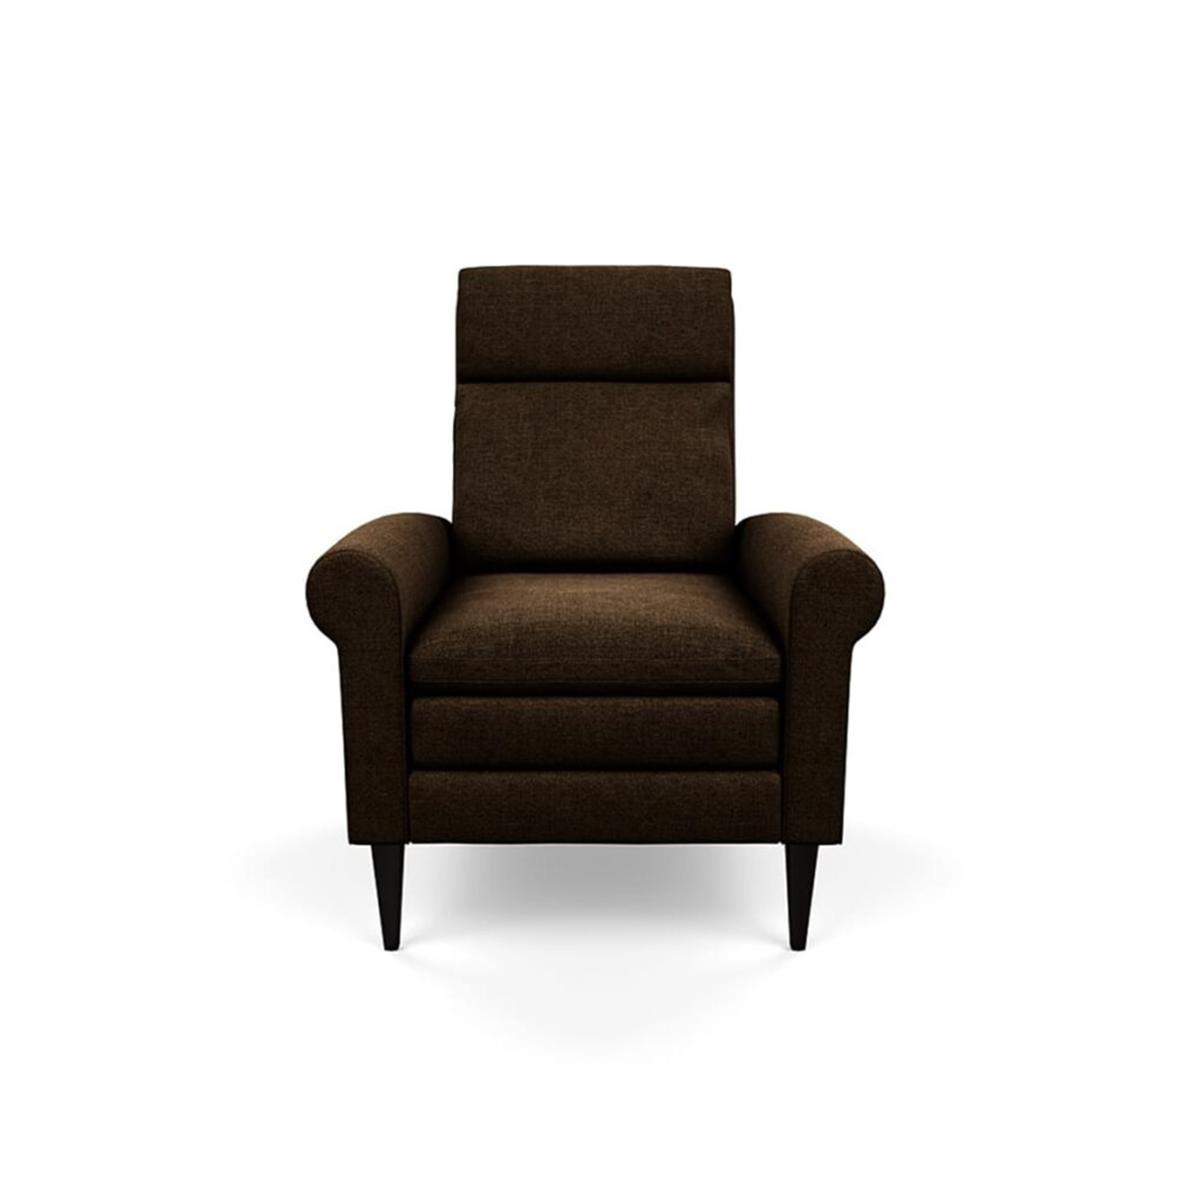 American Leather Burke Fabric Chair Home Furniture Carmel California